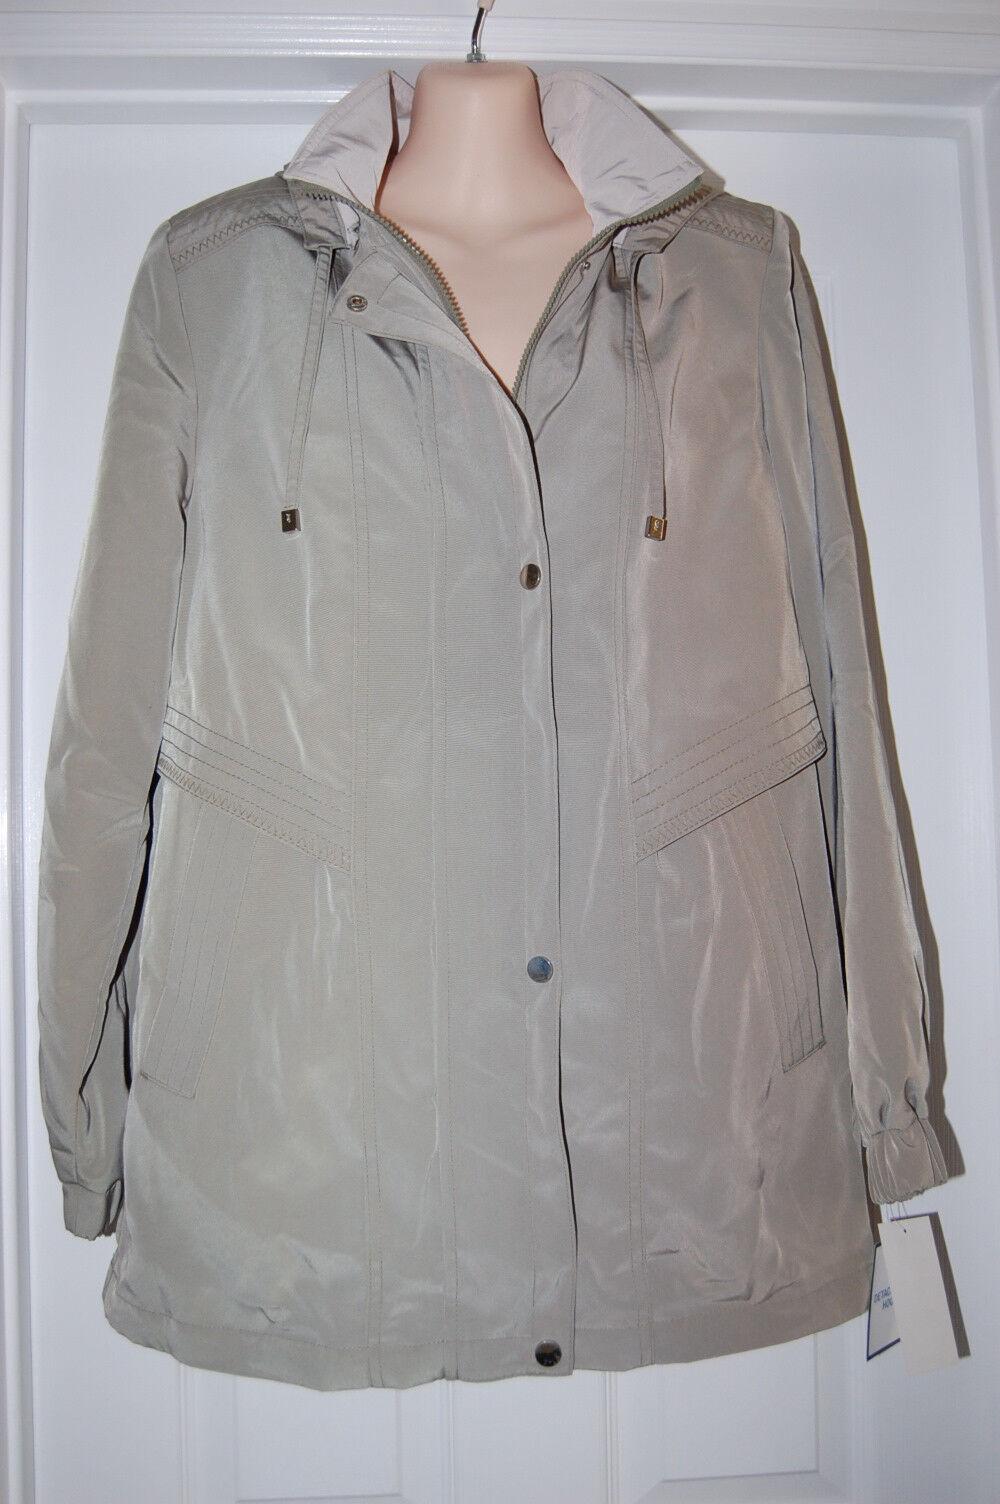 NEW  Woman's Winter Coat Size  S  Croft & Barrow Detachable Hood   Retails  85